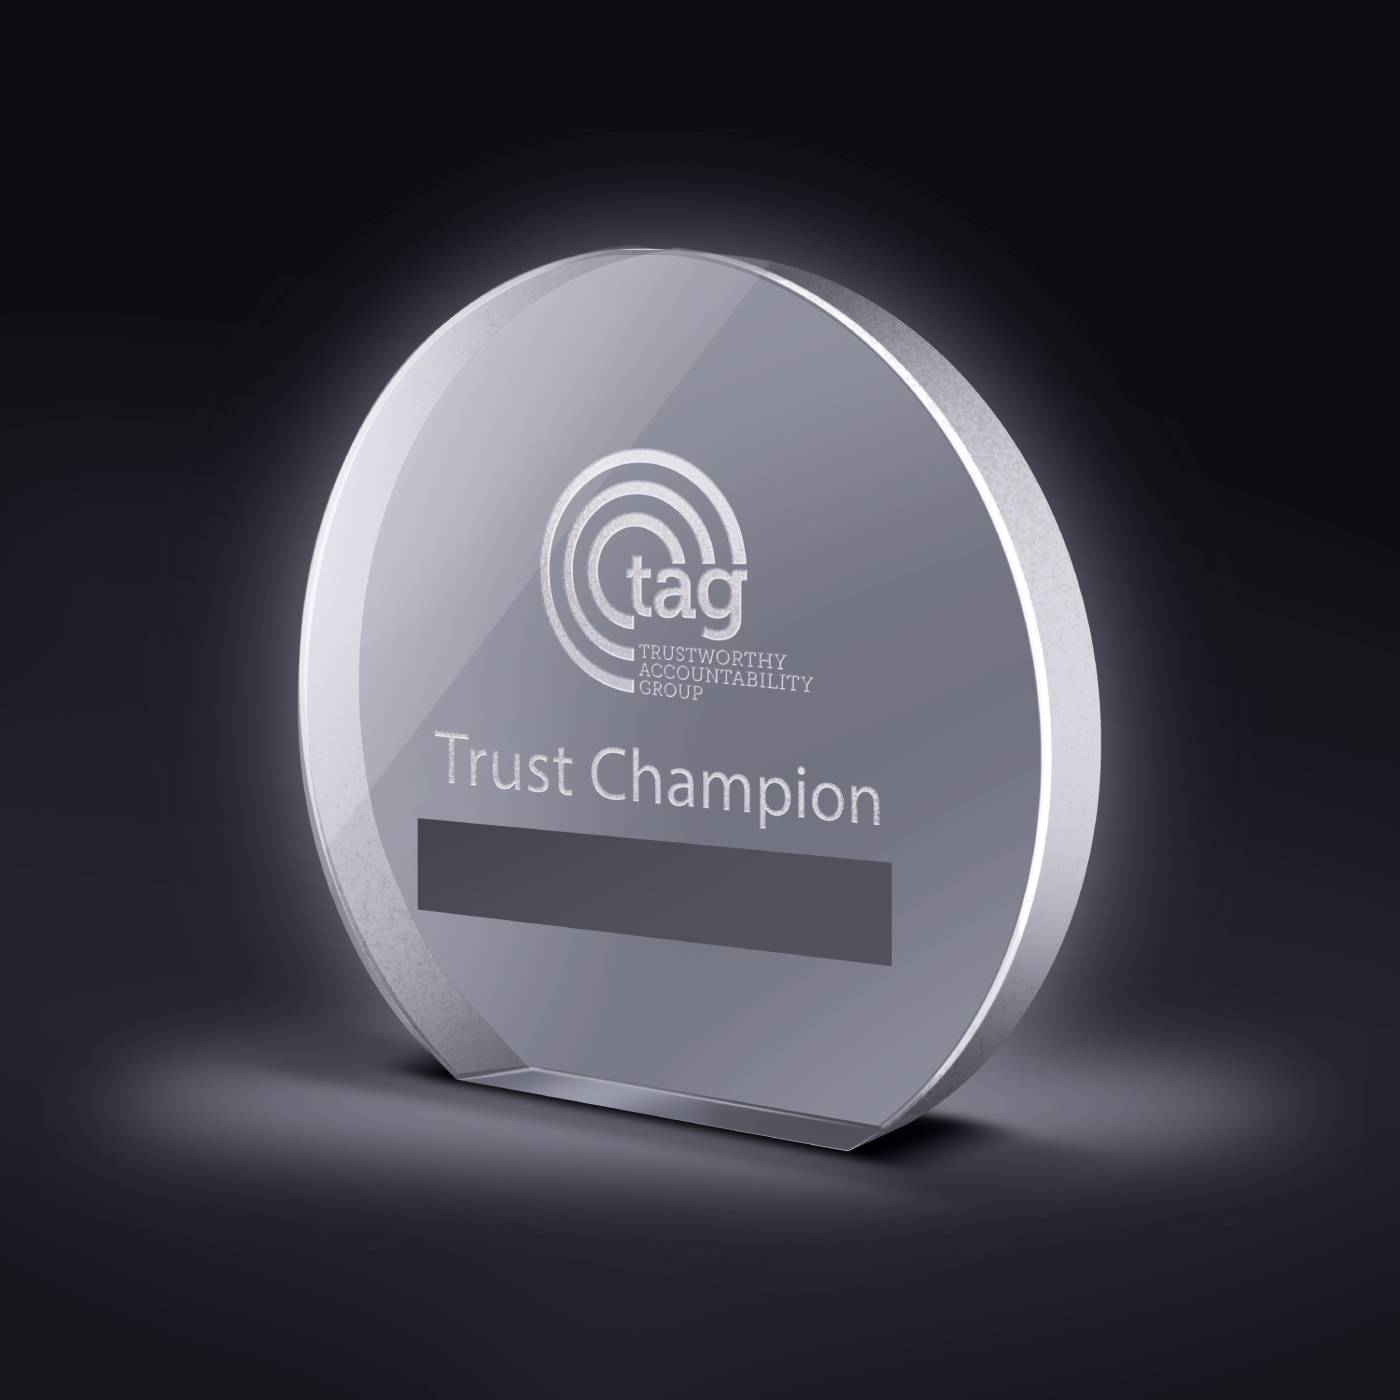 trust-champion-award